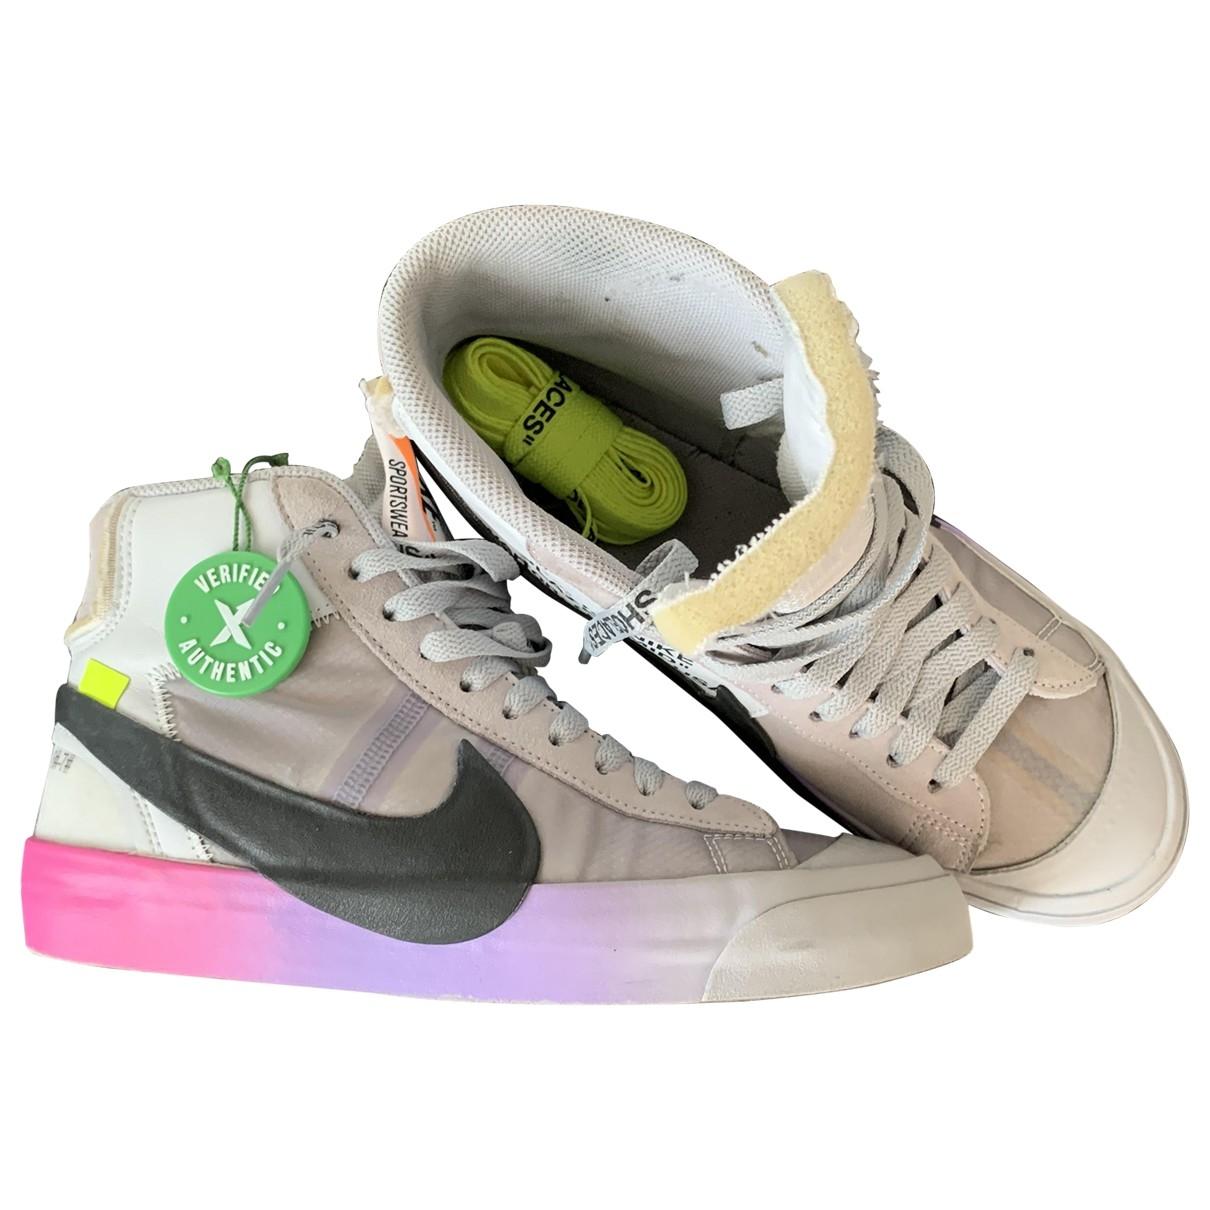 Nike X Off-white - Baskets Blazer Mid pour femme en toile - gris